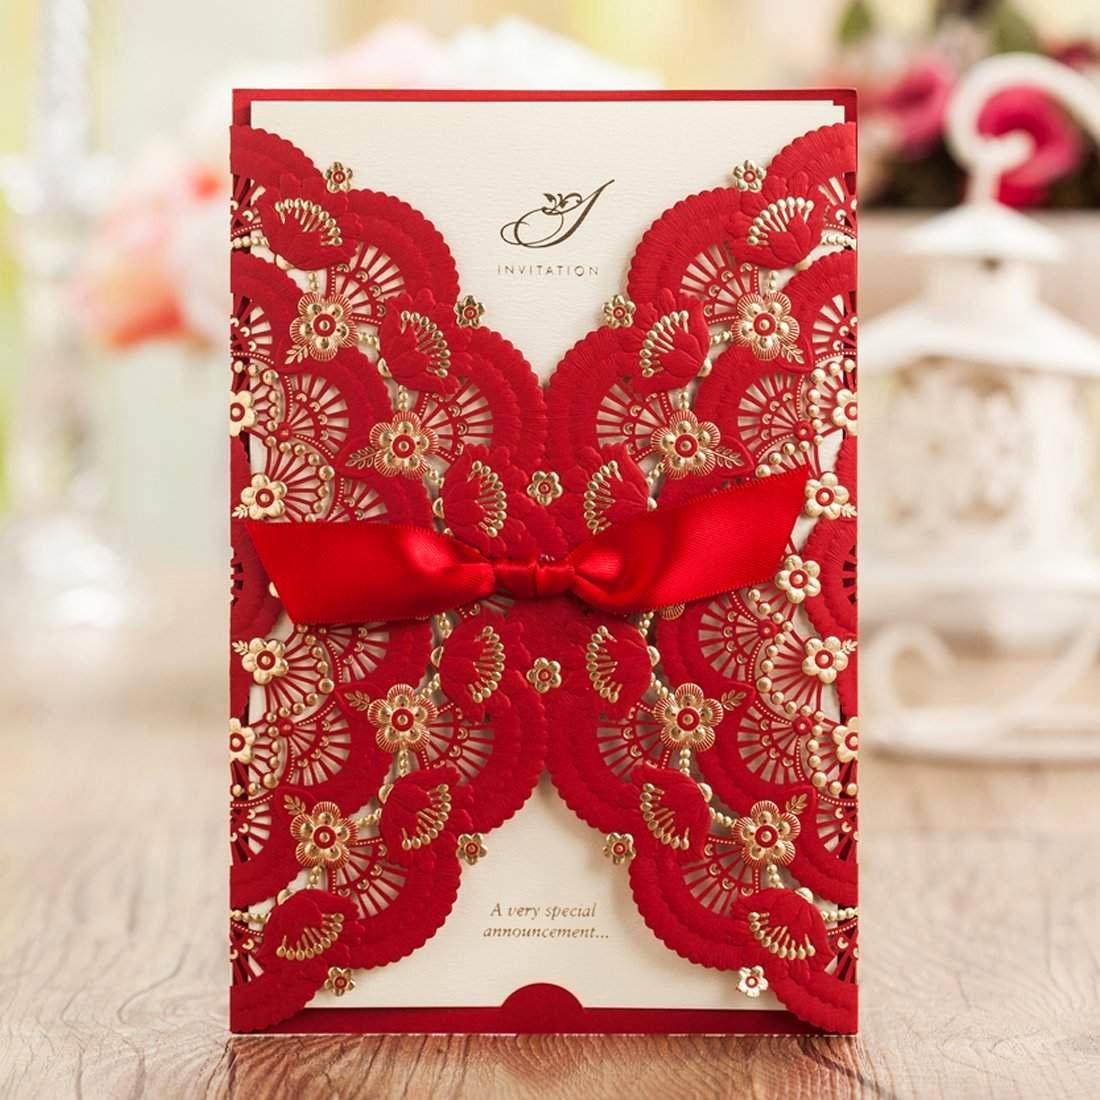 Cheap Wedding Invitation Ideas Elegant top 10 Best Cheap Diy Wedding Invitations